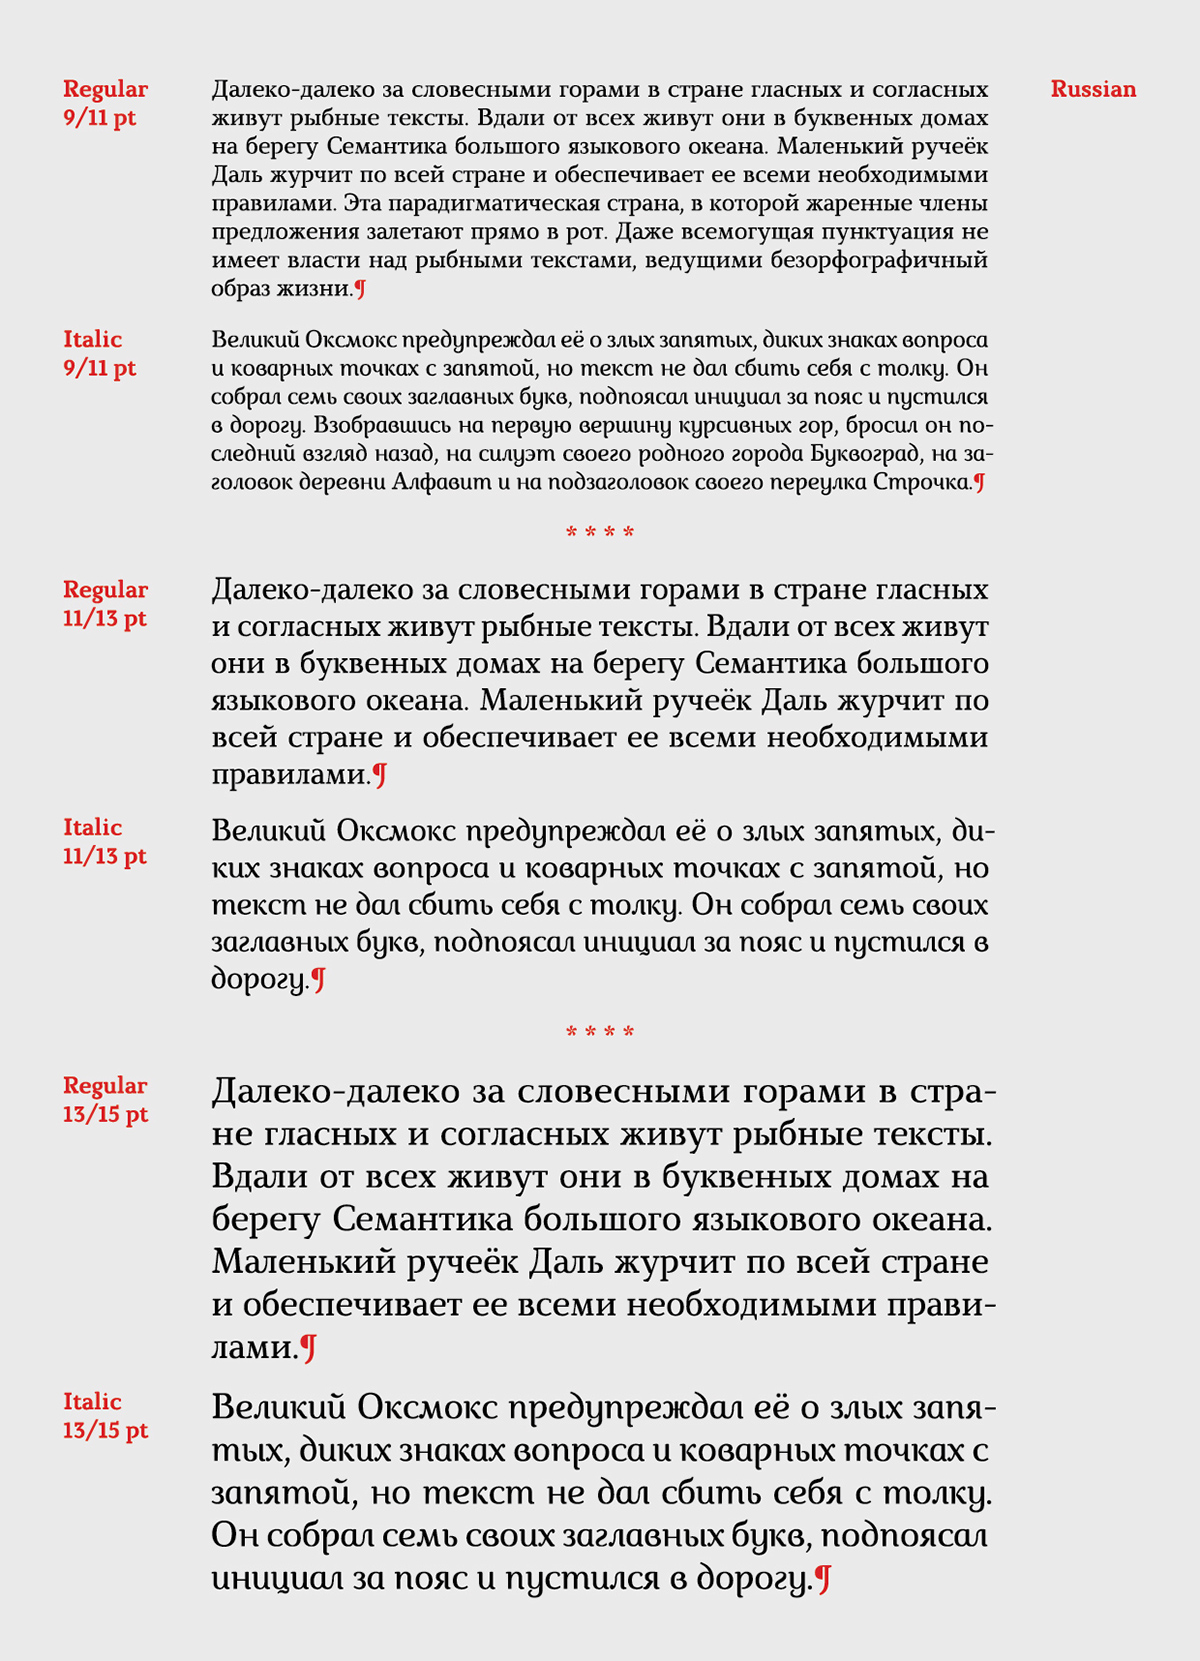 type Cyrillic alphabet face font roman text freefont marta serif italic Verticall Italic vertically. wedge serifs free fonts